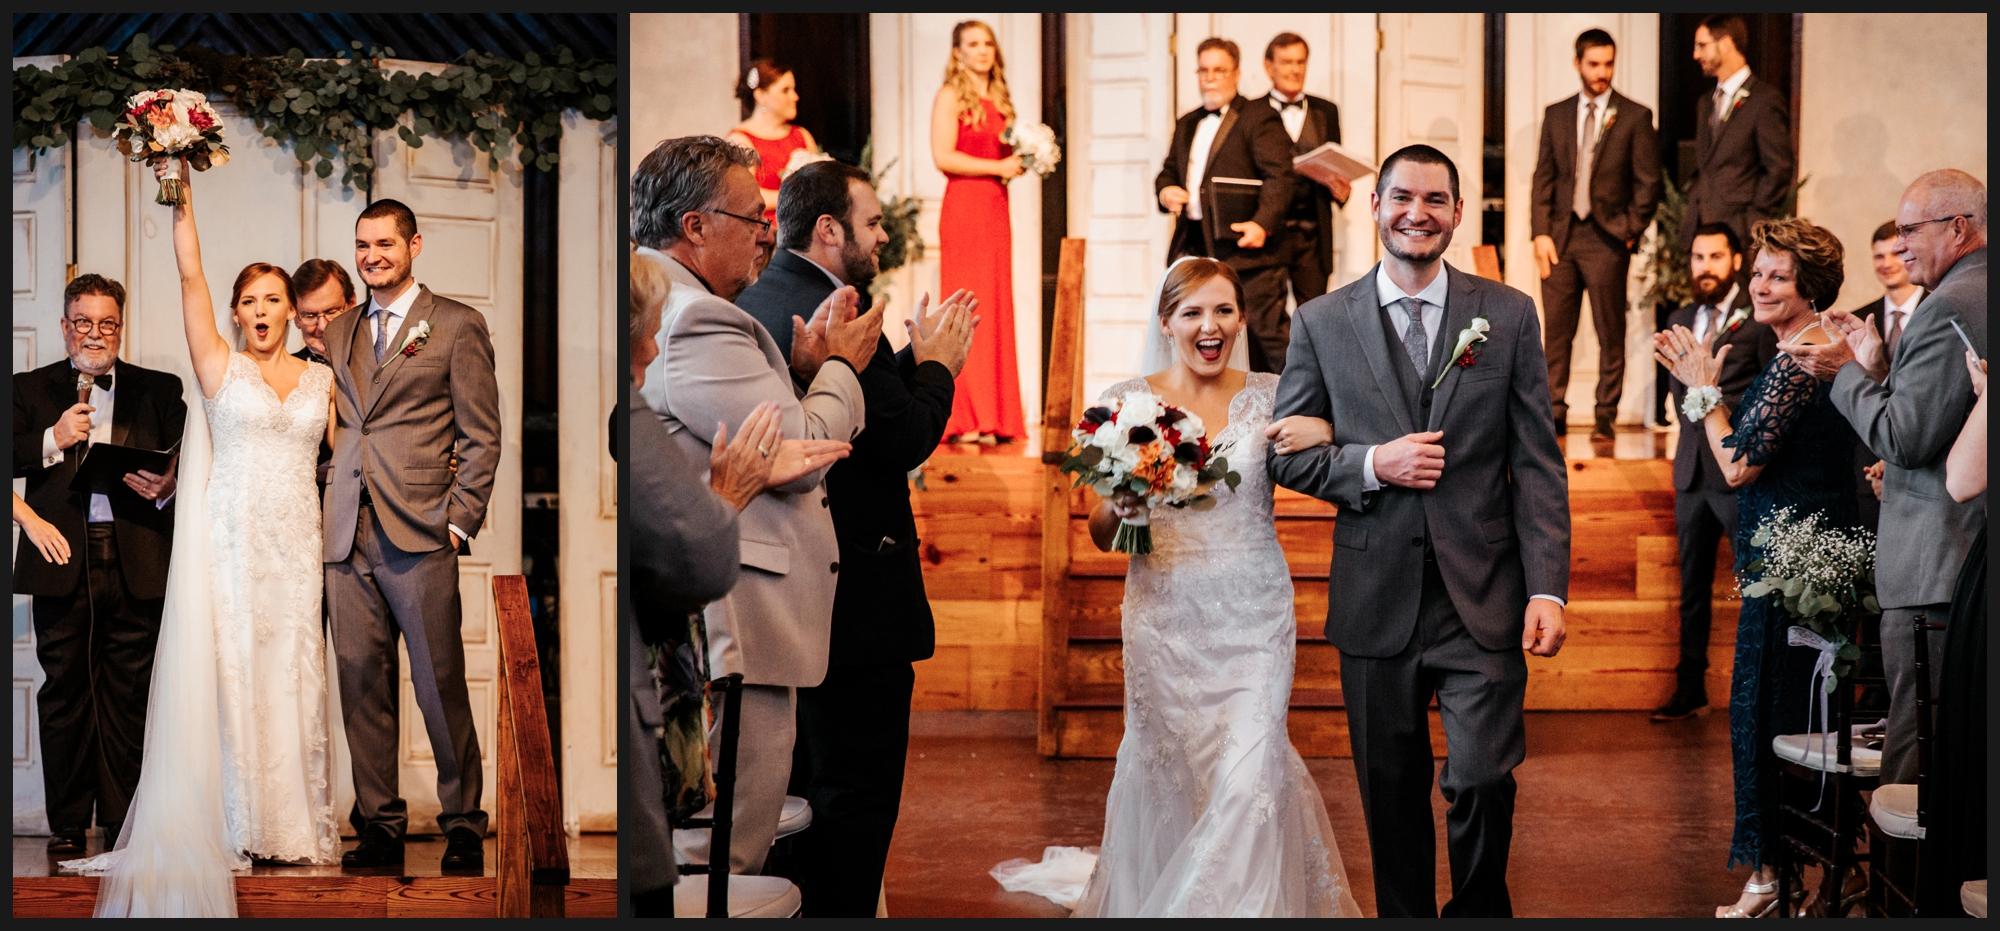 Orlando-Wedding-Photographer-destination-wedding-photographer-florida-wedding-photographer-bohemian-wedding-photographer_0562.jpg